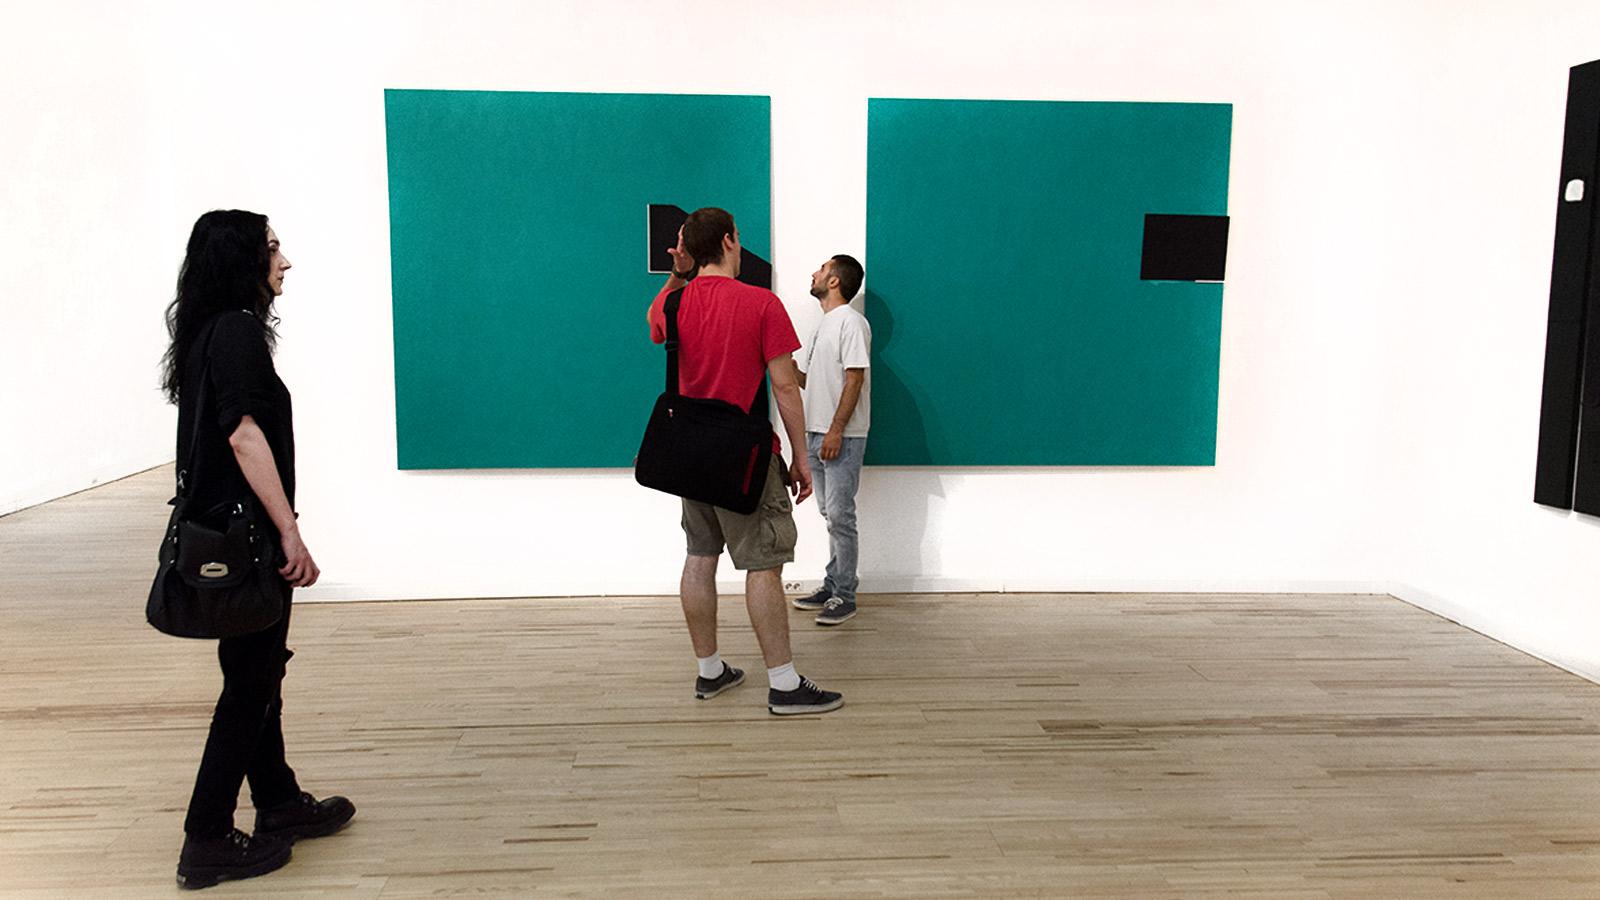 goran despotovski, painting, amfora